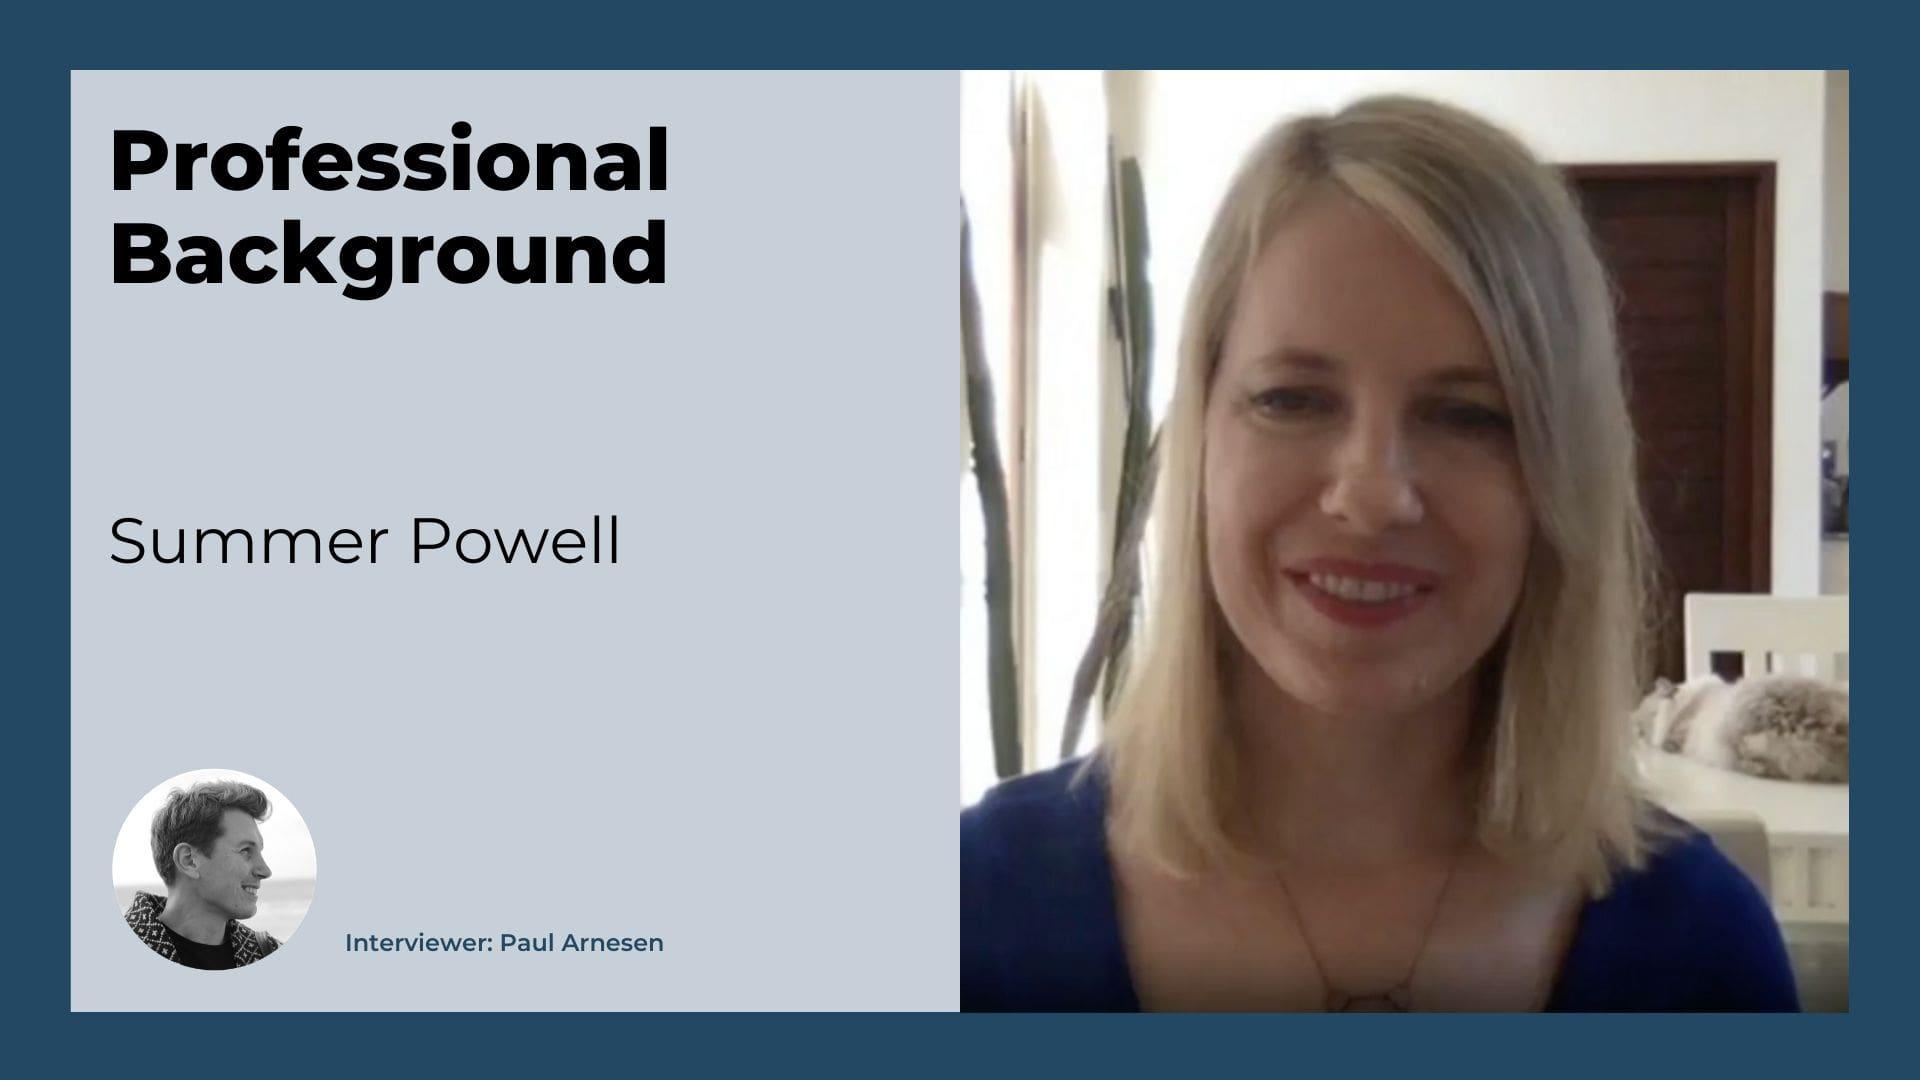 Summer Powell